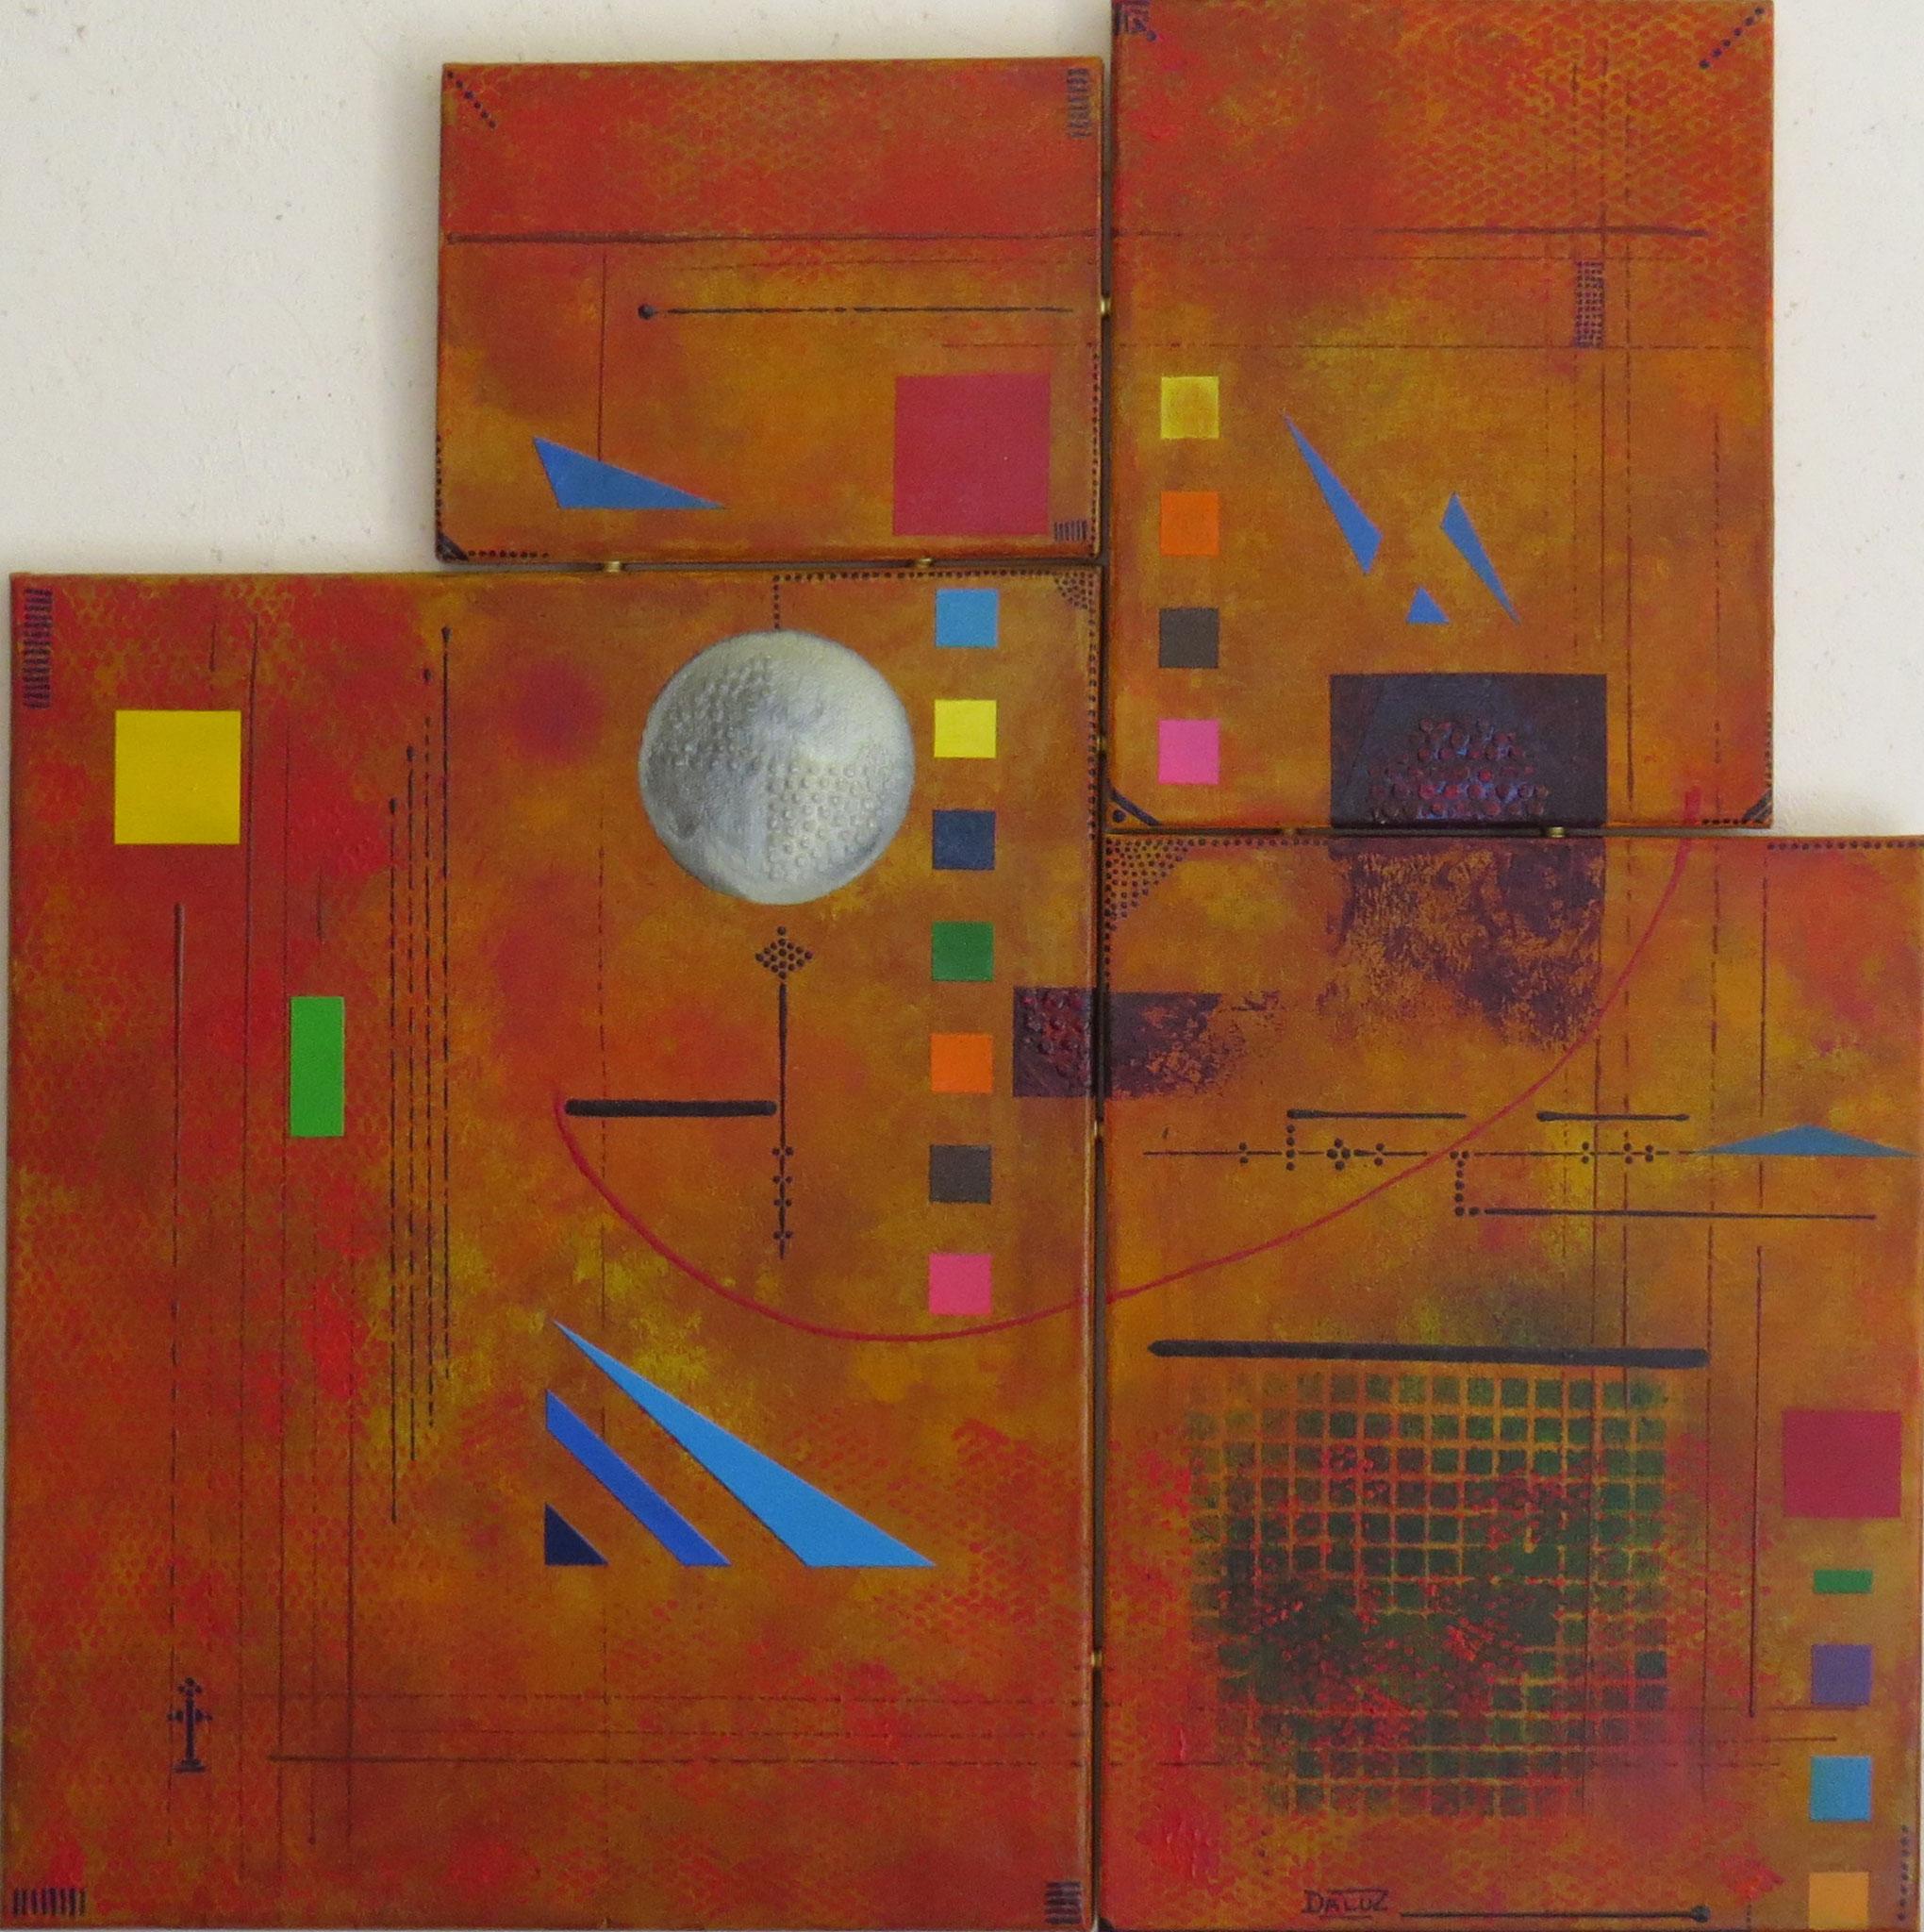 sigma - vue face1 - DALUZ GALEGO - peinture abstraite